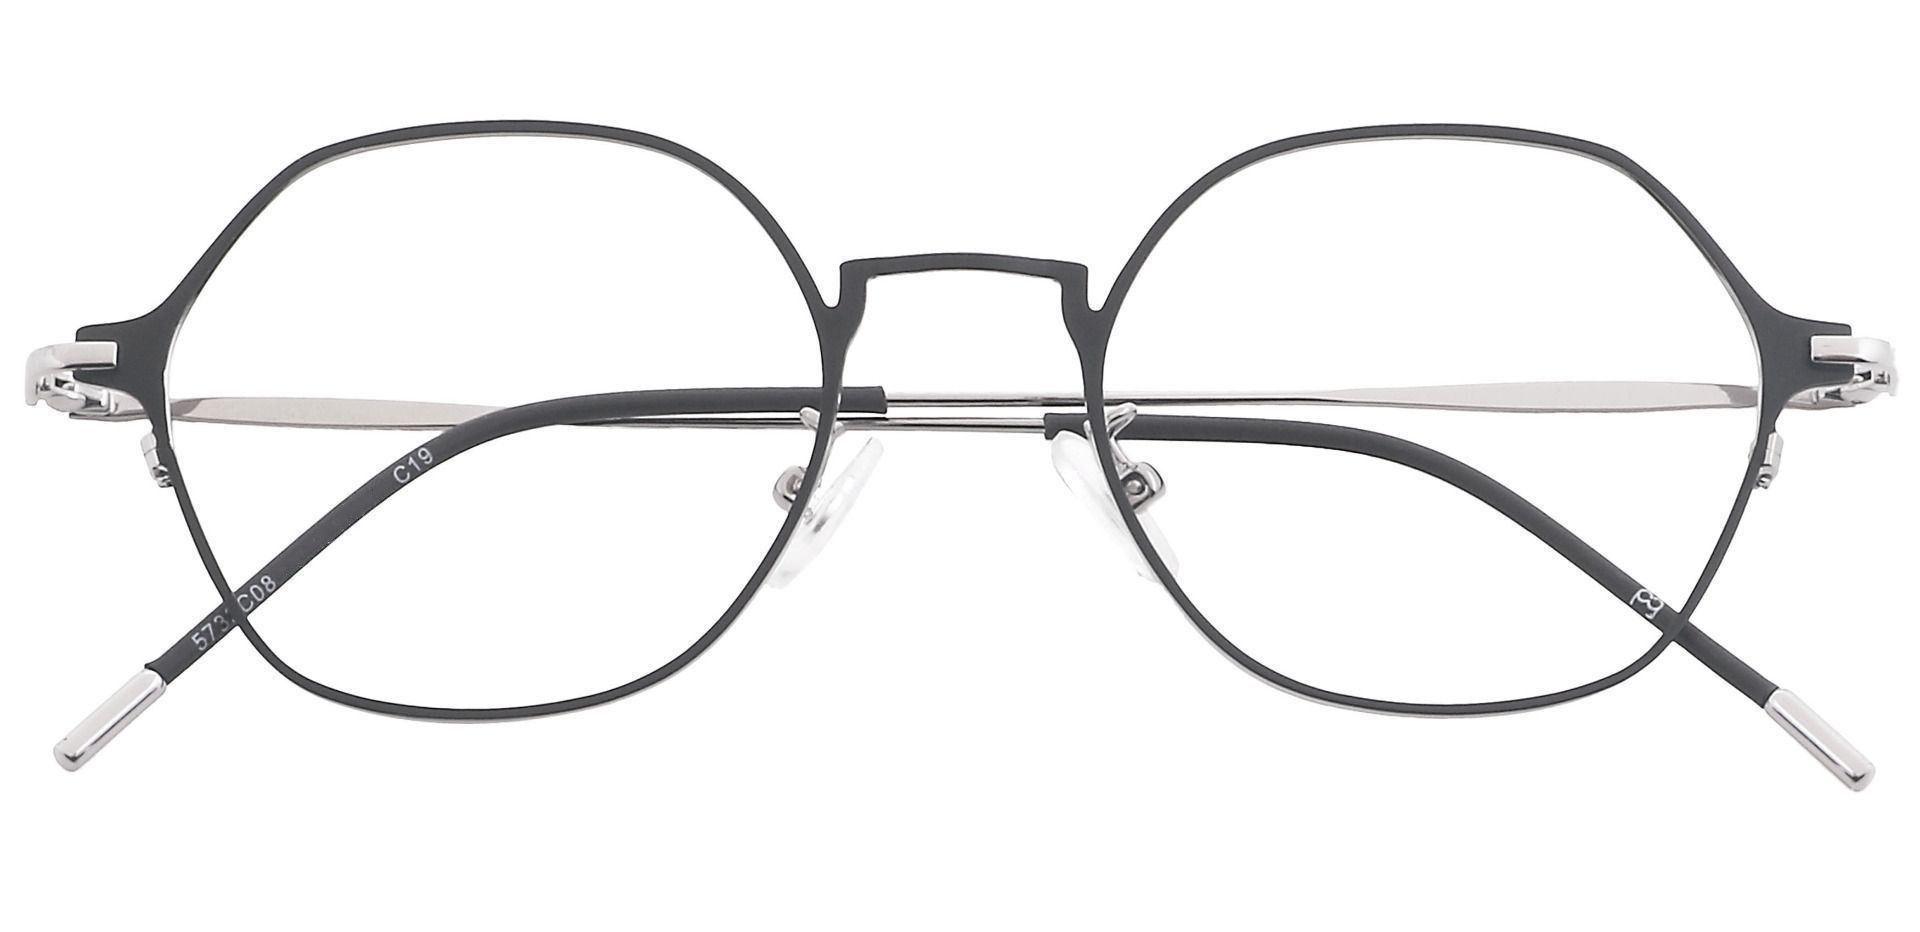 Nola Oval Blue Light Blocking Glasses - Clear